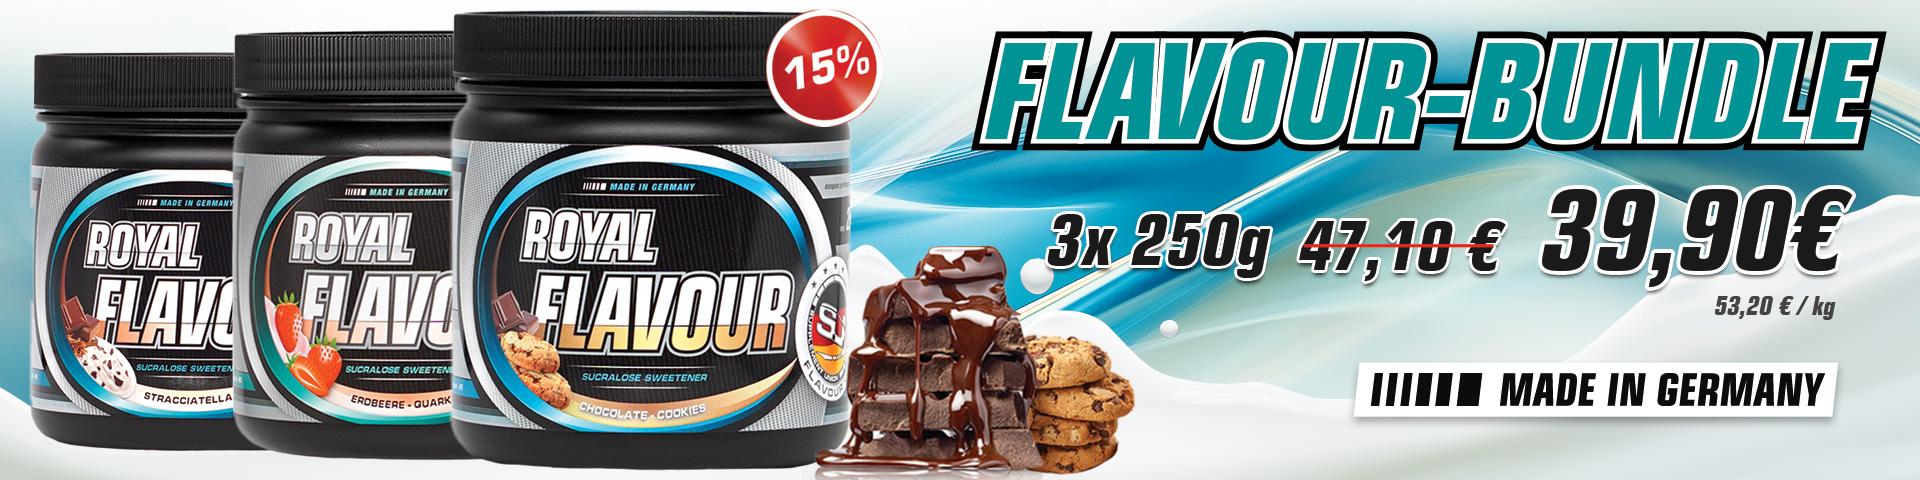 flavour_bundle-februar-2.jpg